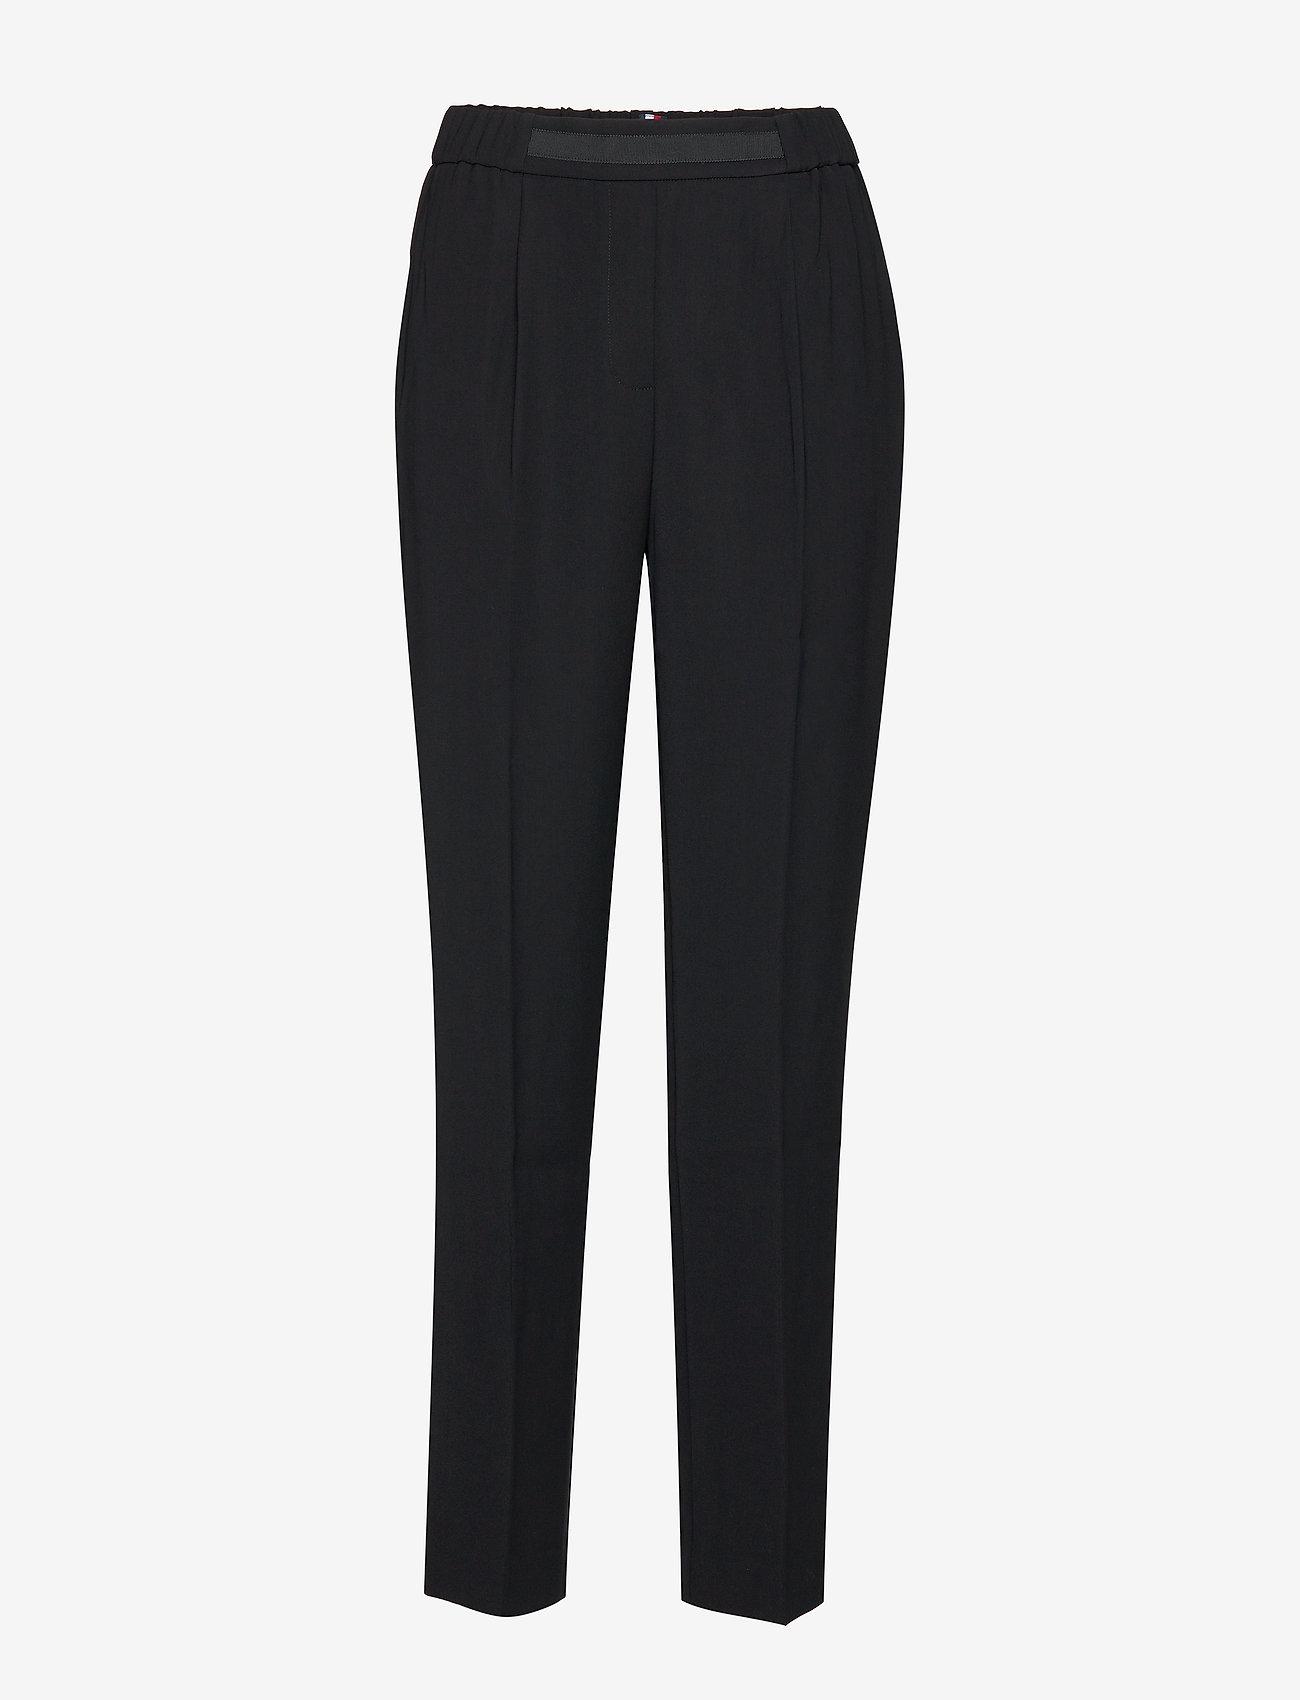 Tommy Hilfiger - FARAH PULL ON PANT - straight leg trousers - meteorite - 0